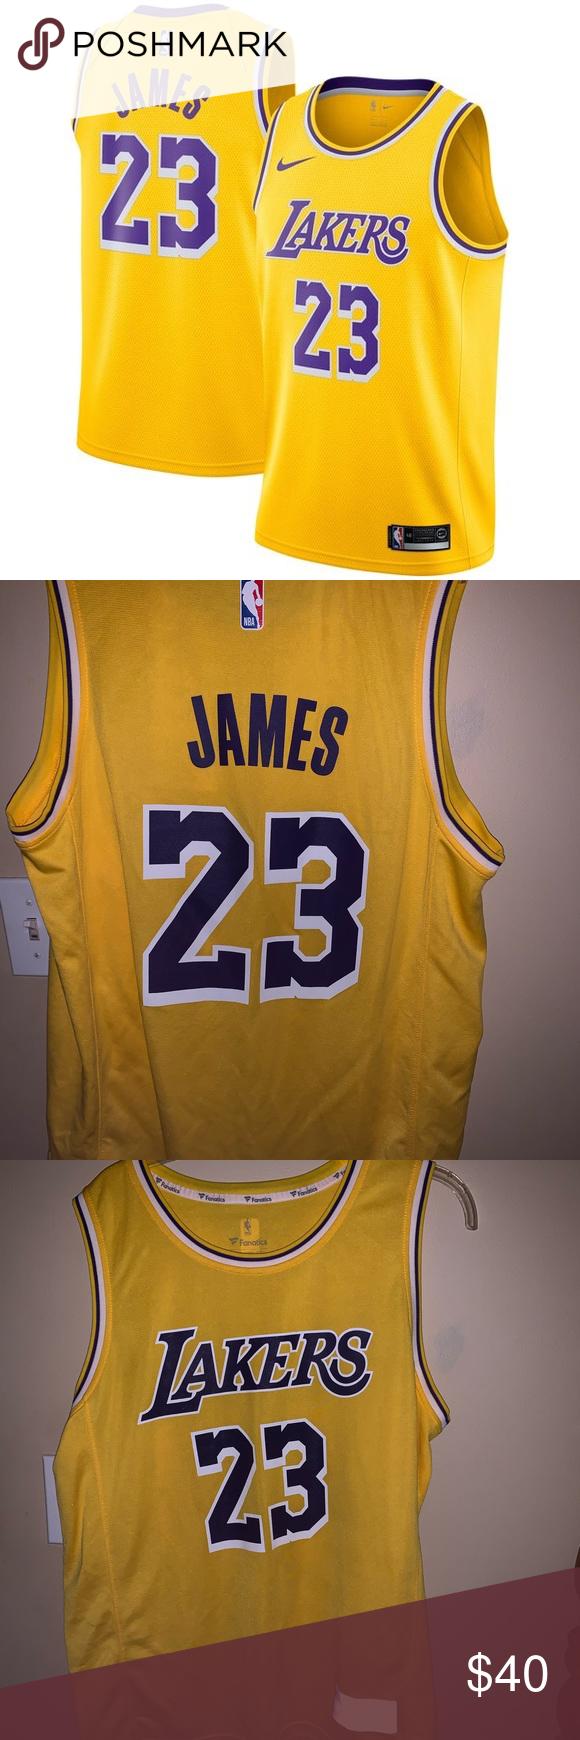 LeBron James LA Lakers 2018/19 Jersey